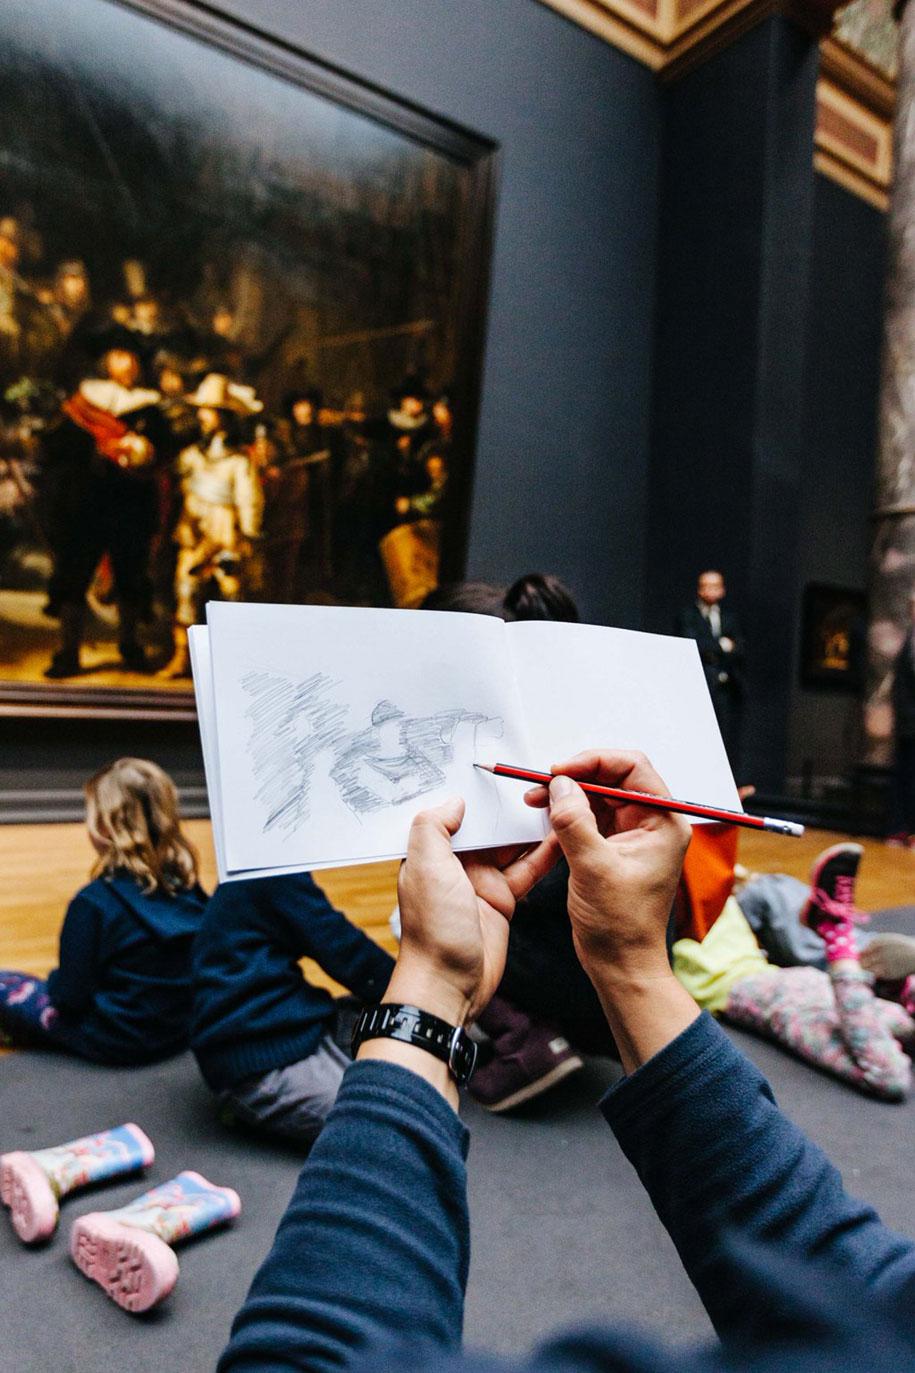 museum-visitor-drawing-sketching-startdrawing-rijksmuseum-amsterdam-7